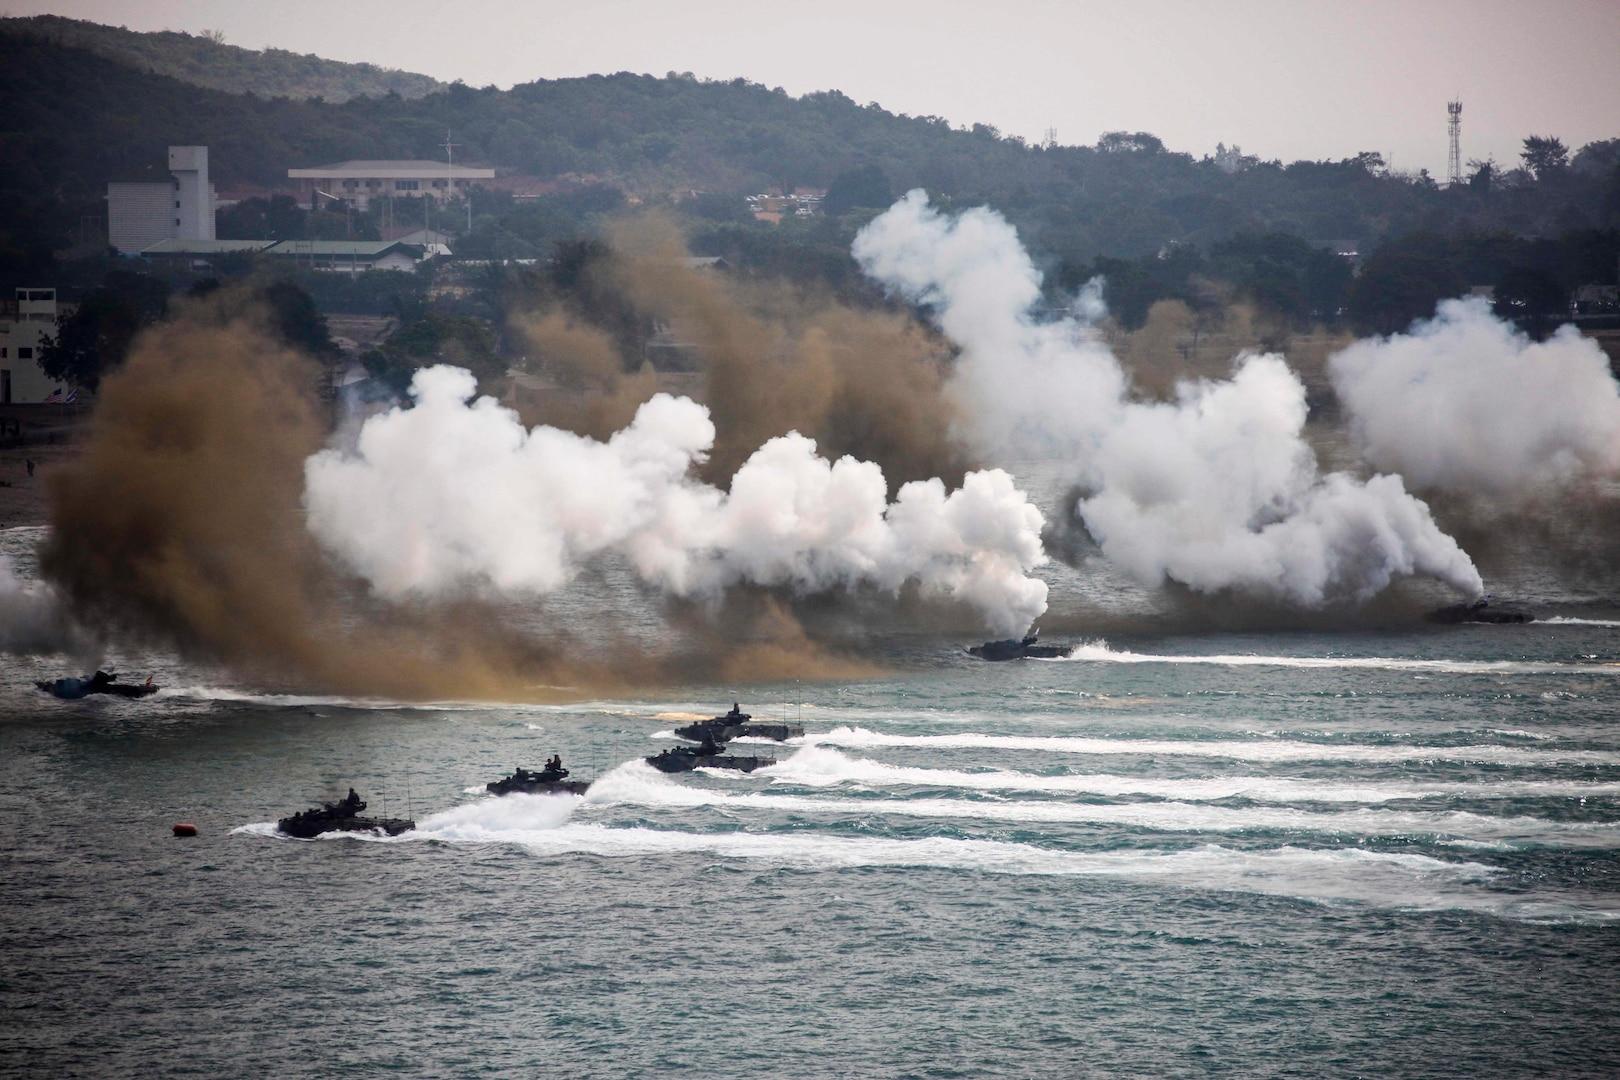 Amphibious assault exercise during Cobra Gold 2018, at Hat Yao, Thailand, February 16, 2018 (U.S. Marine Corps/Olivia G. Ortiz)